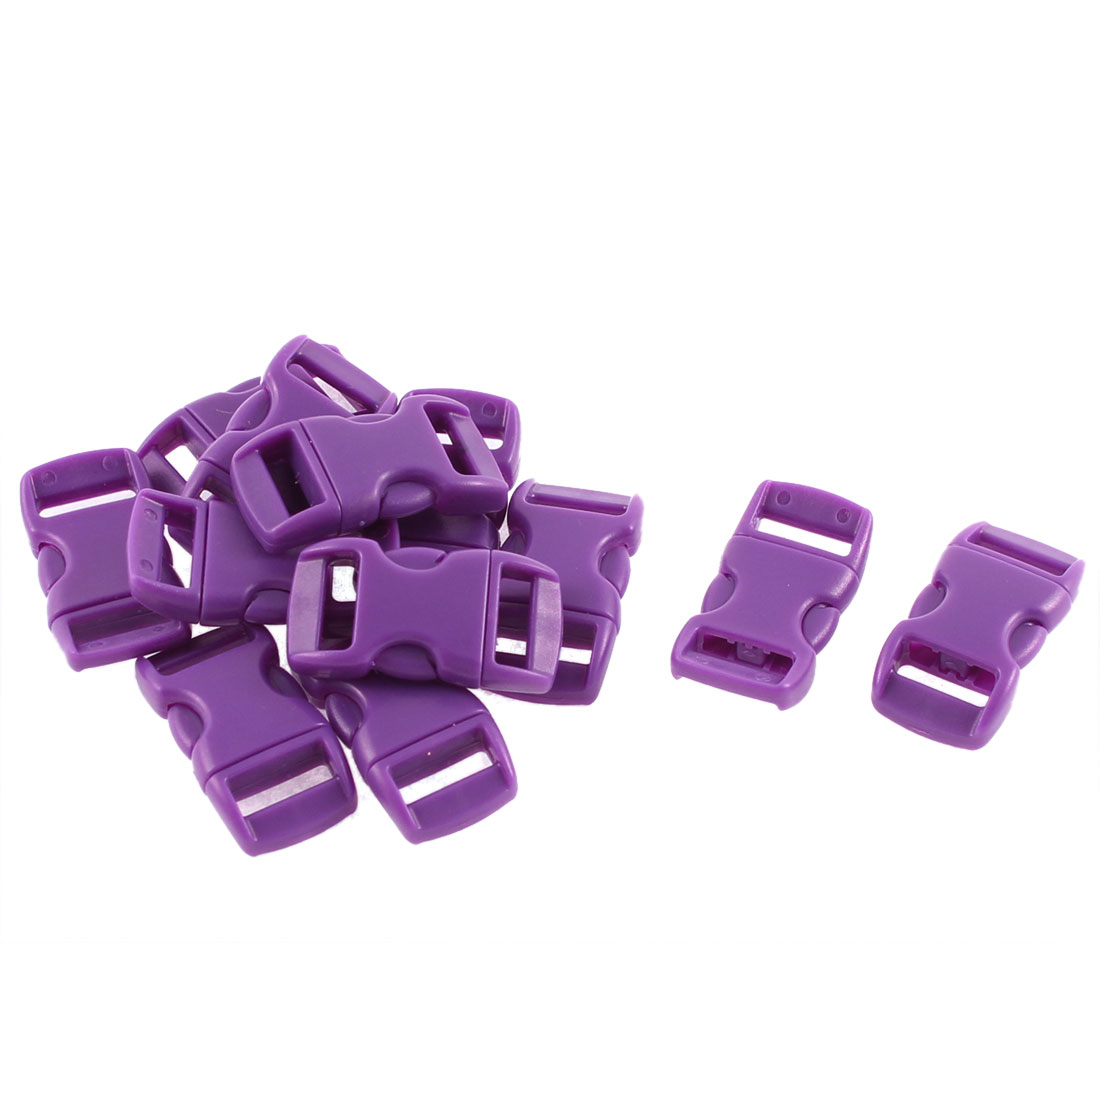 Webbing Strap Backpack Plastic Side Release Buckle Purple 11mm Band 12pcs